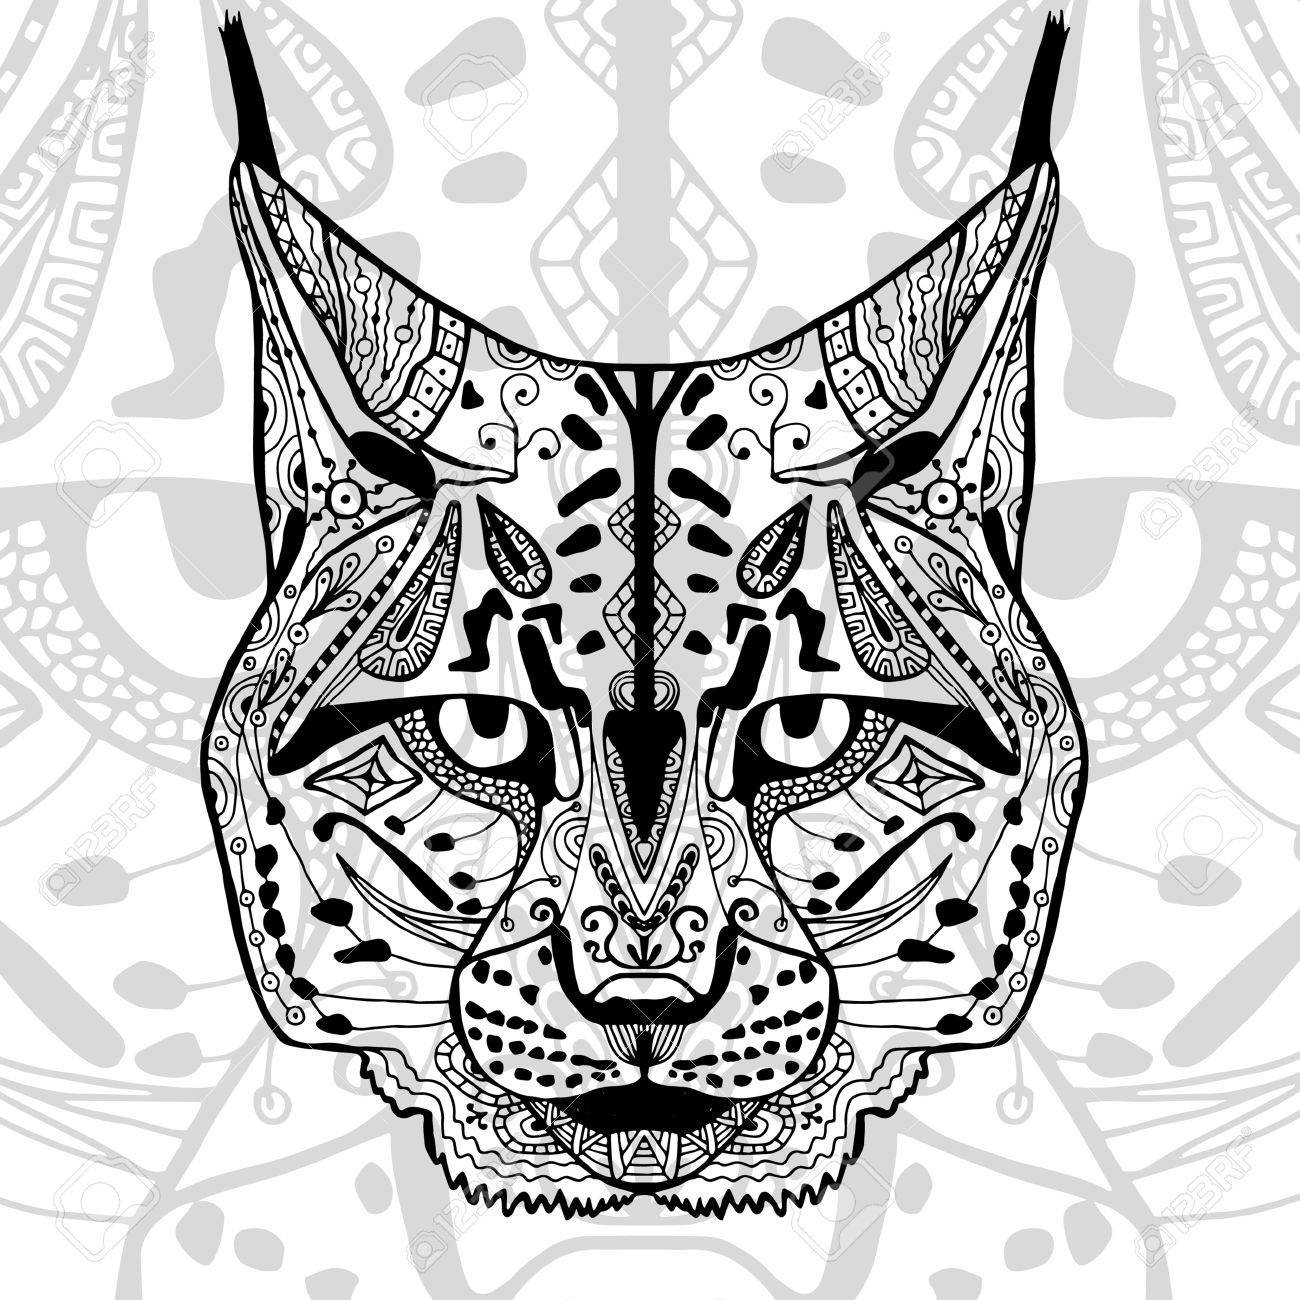 lynx cartoon stock photos royalty free lynx cartoon images and